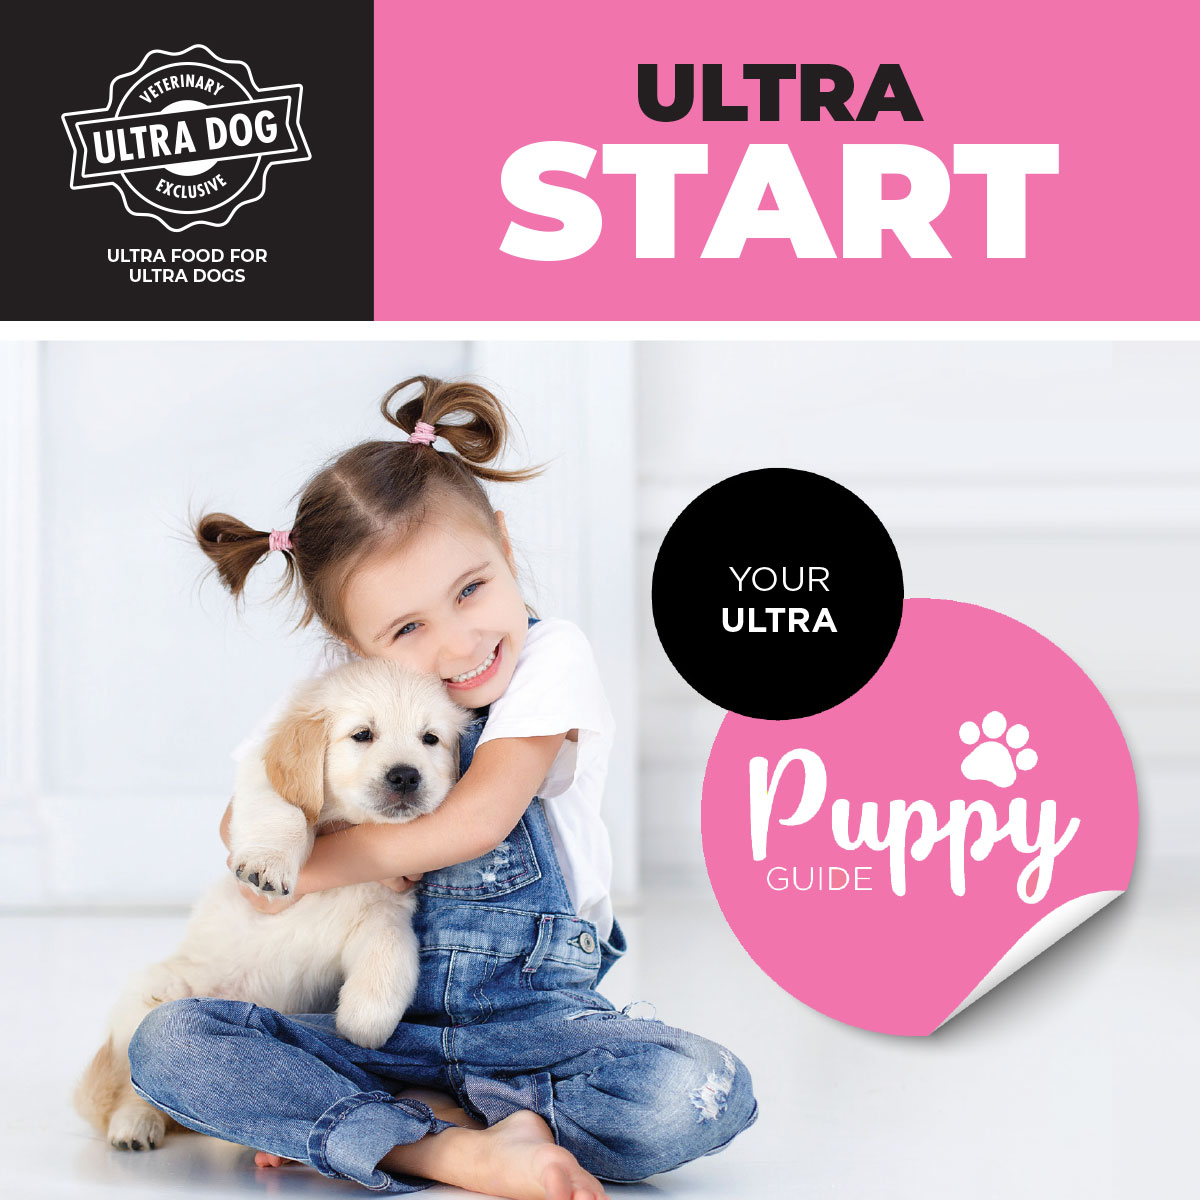 UltraDog Puppy Pack